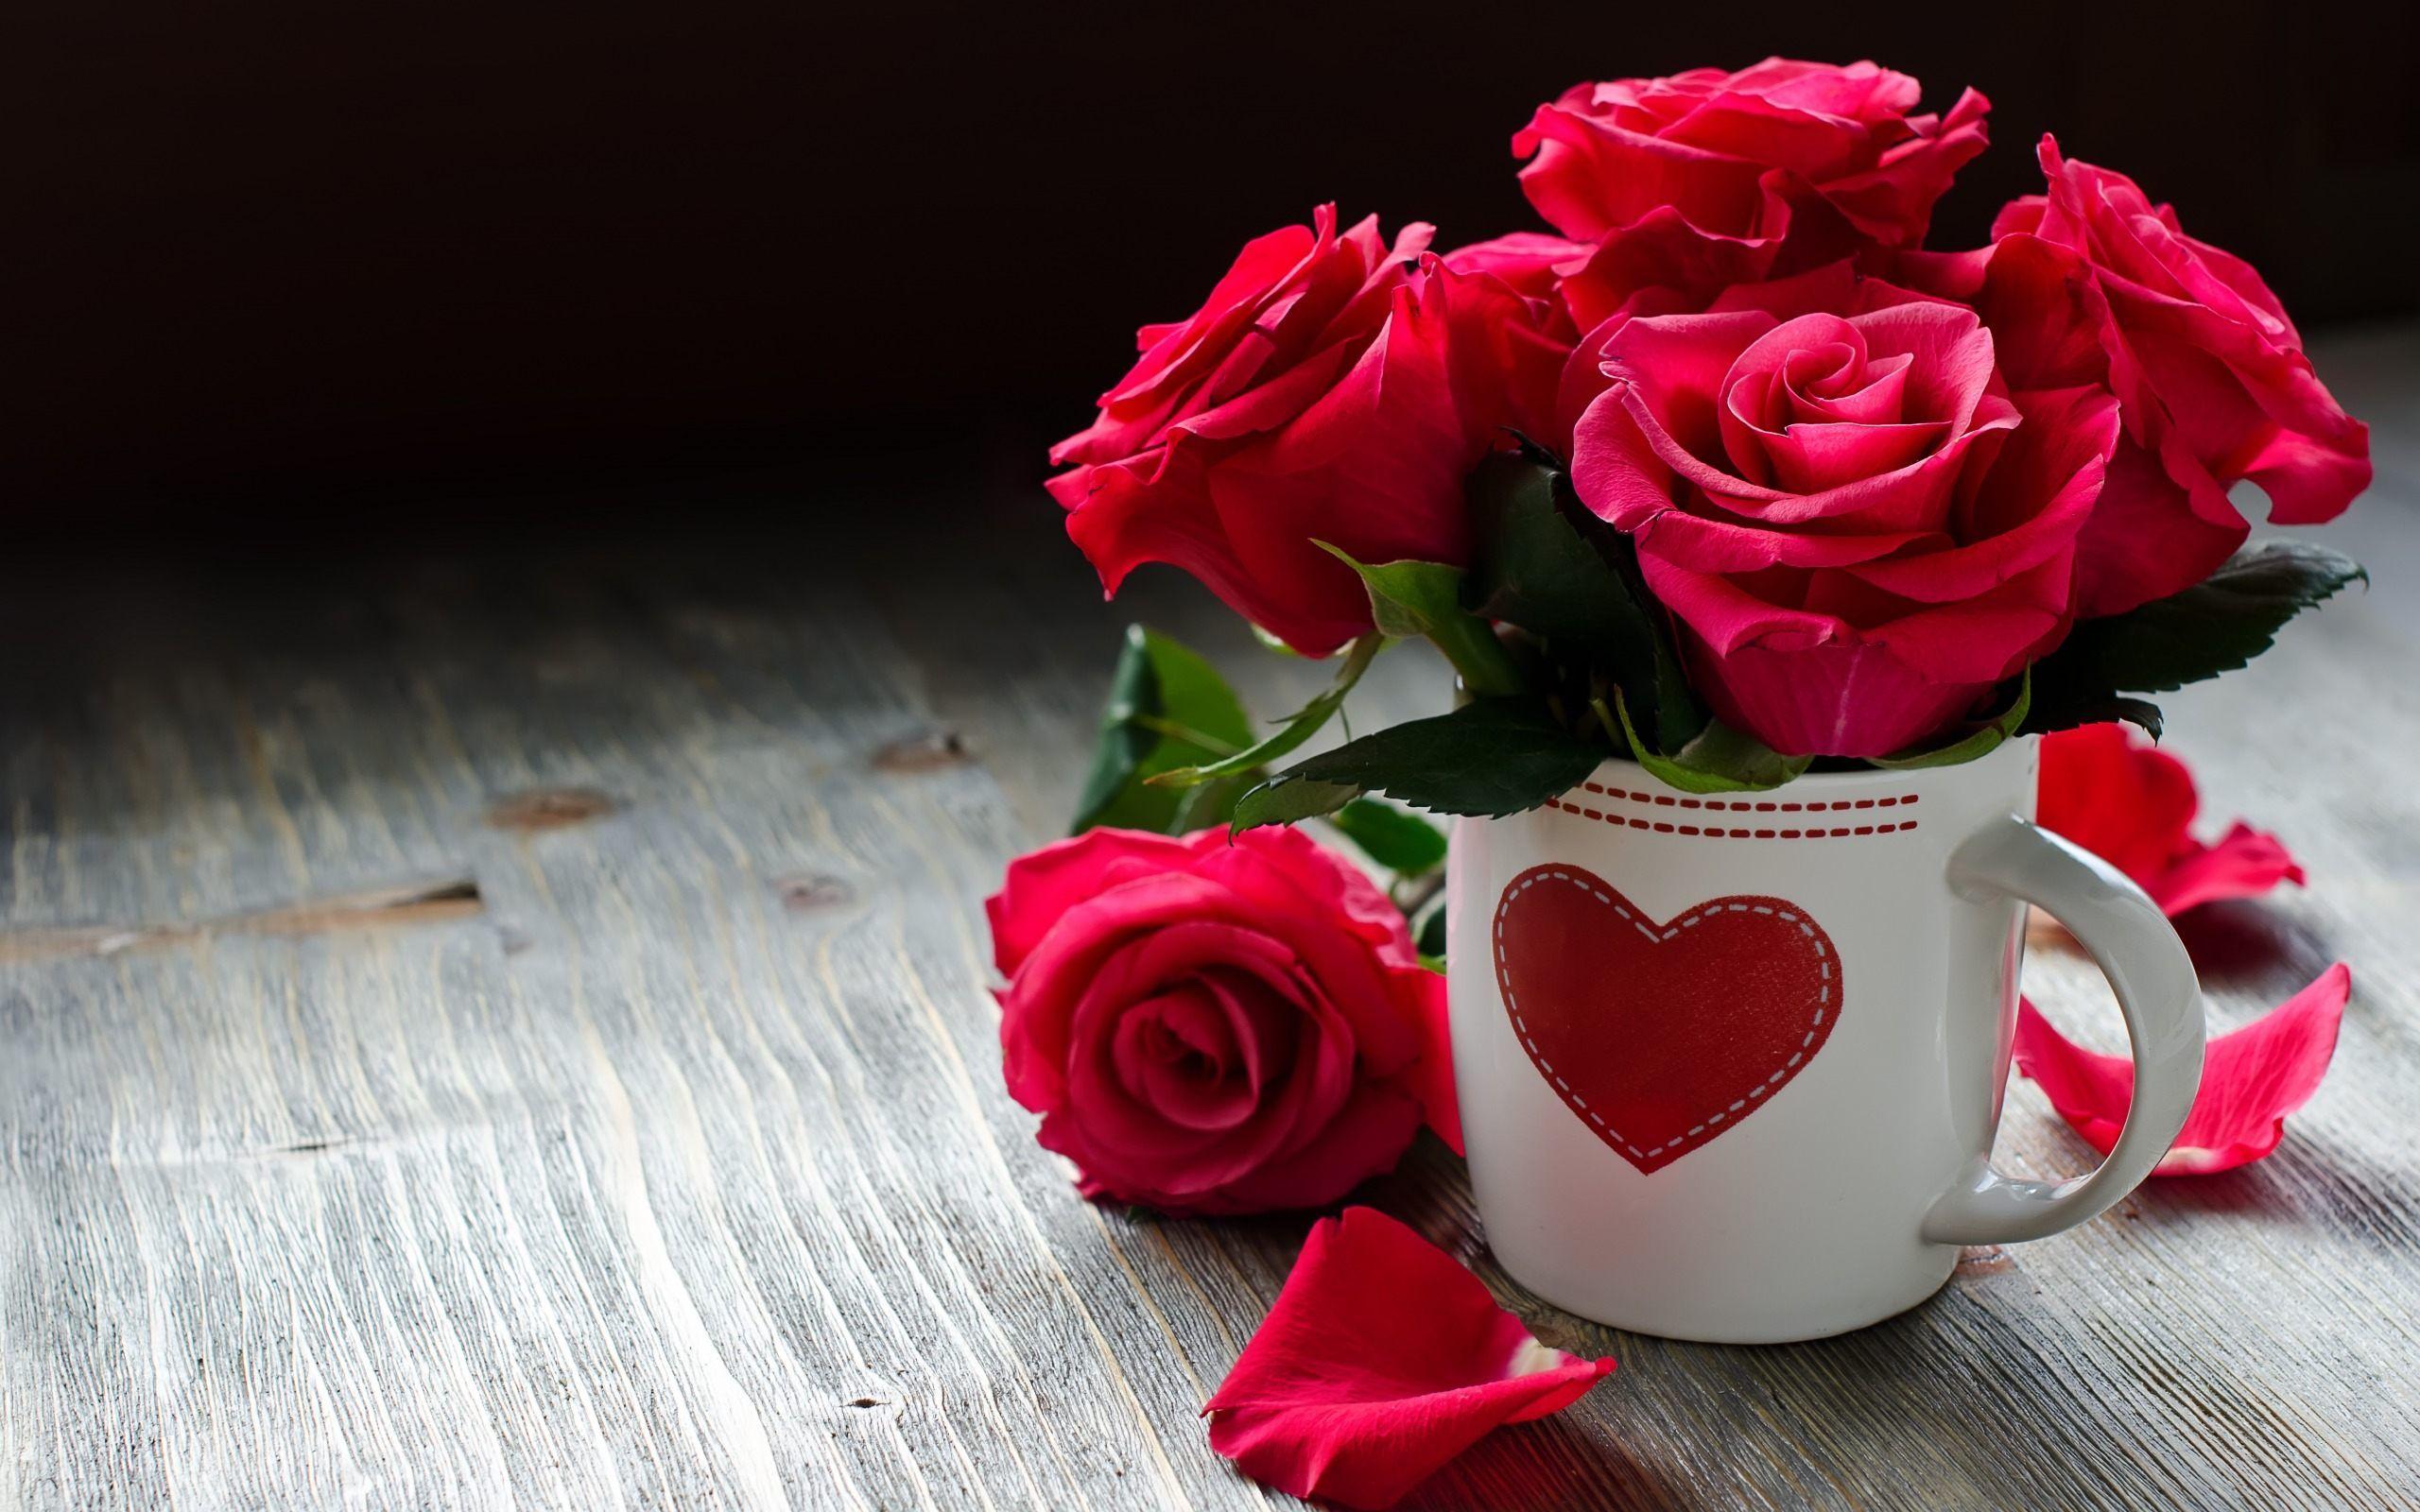 Beautiful Flowers Find Best Latest Beautiful Flowers In Hd For